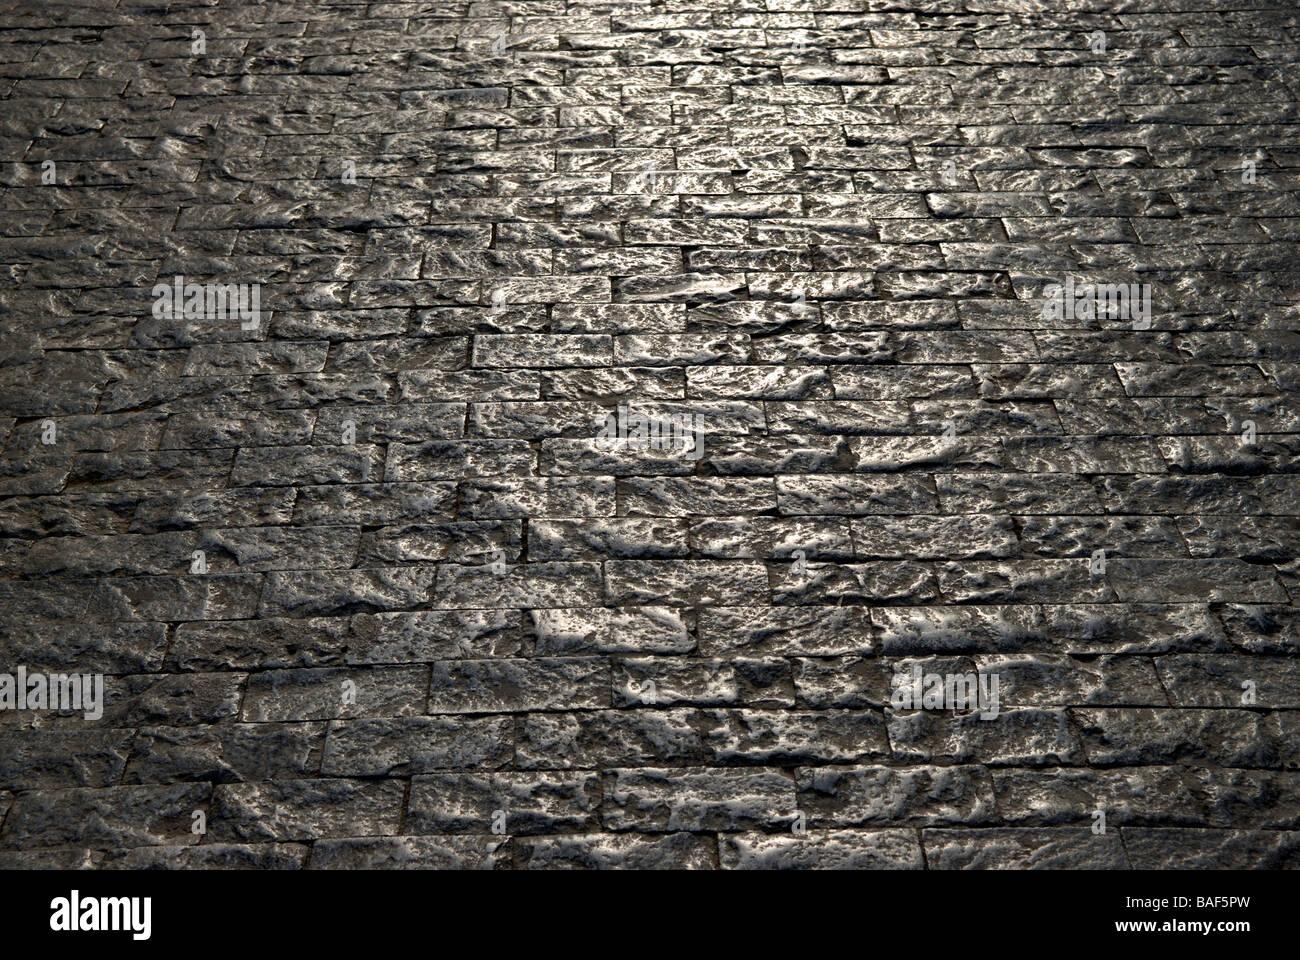 stra e mit kopfsteinpflaster stockfoto bild 23690769 alamy. Black Bedroom Furniture Sets. Home Design Ideas